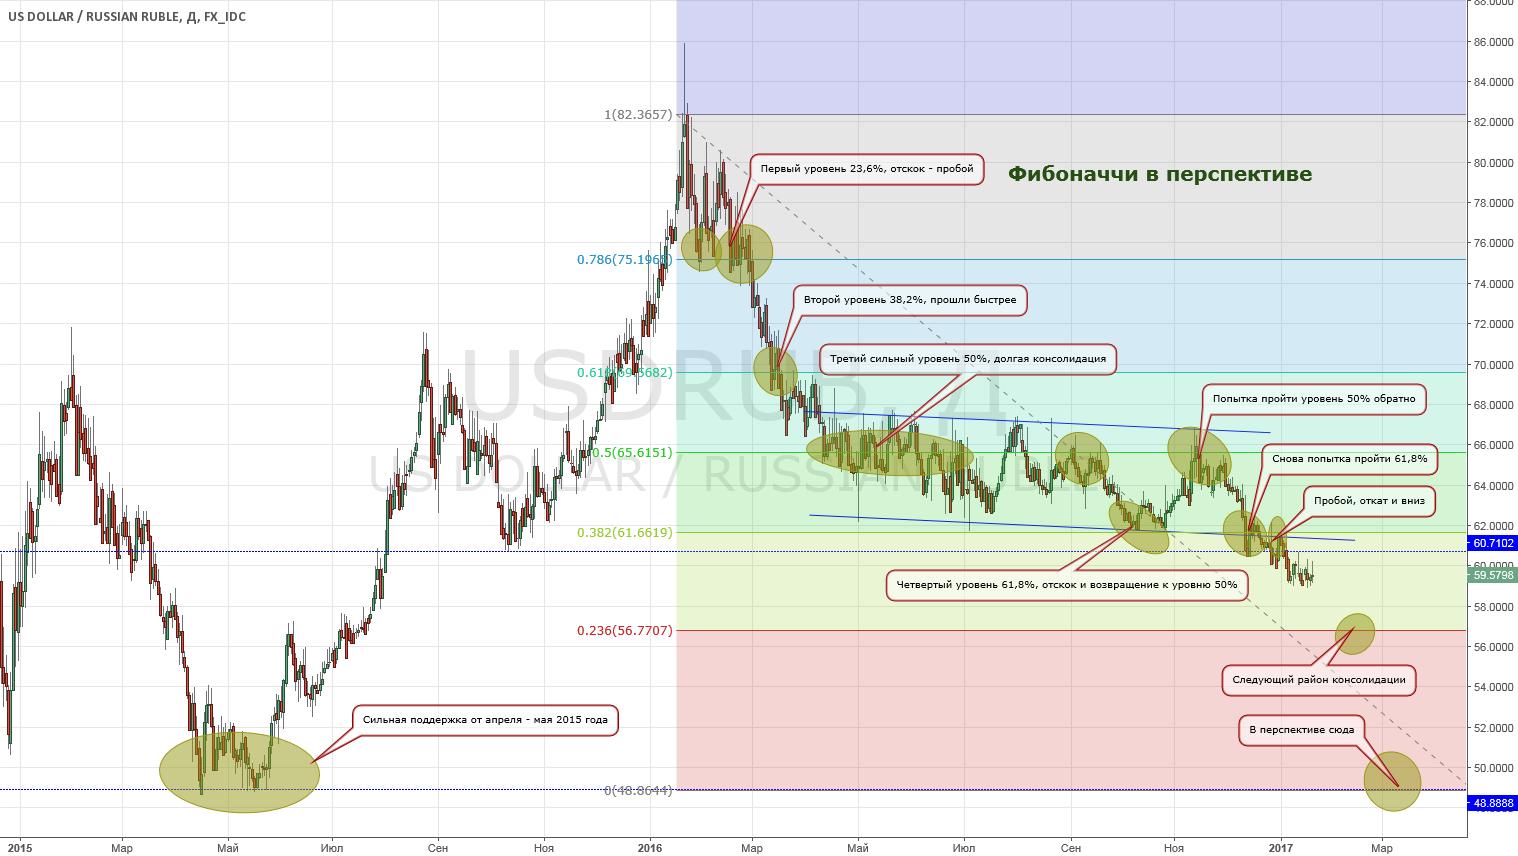 Мысли про доллар/рубль USD/RUB